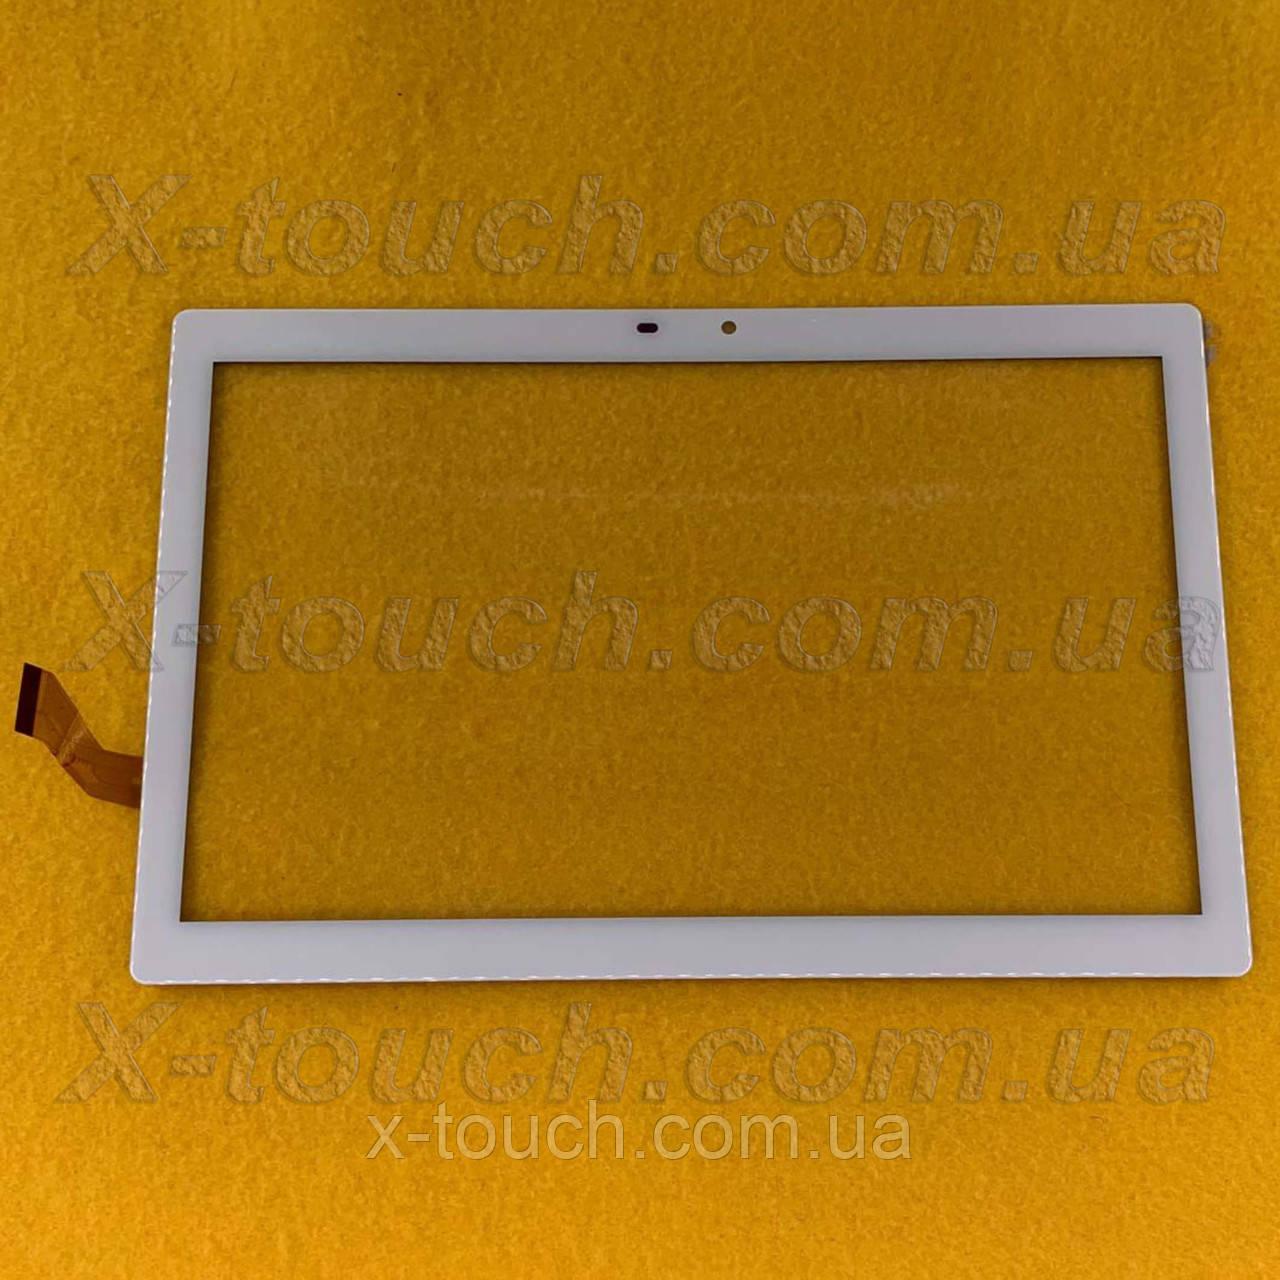 Тачскрин, сенсор Samsung Galaxy Tab Pro 10.1 для планшета, белый.